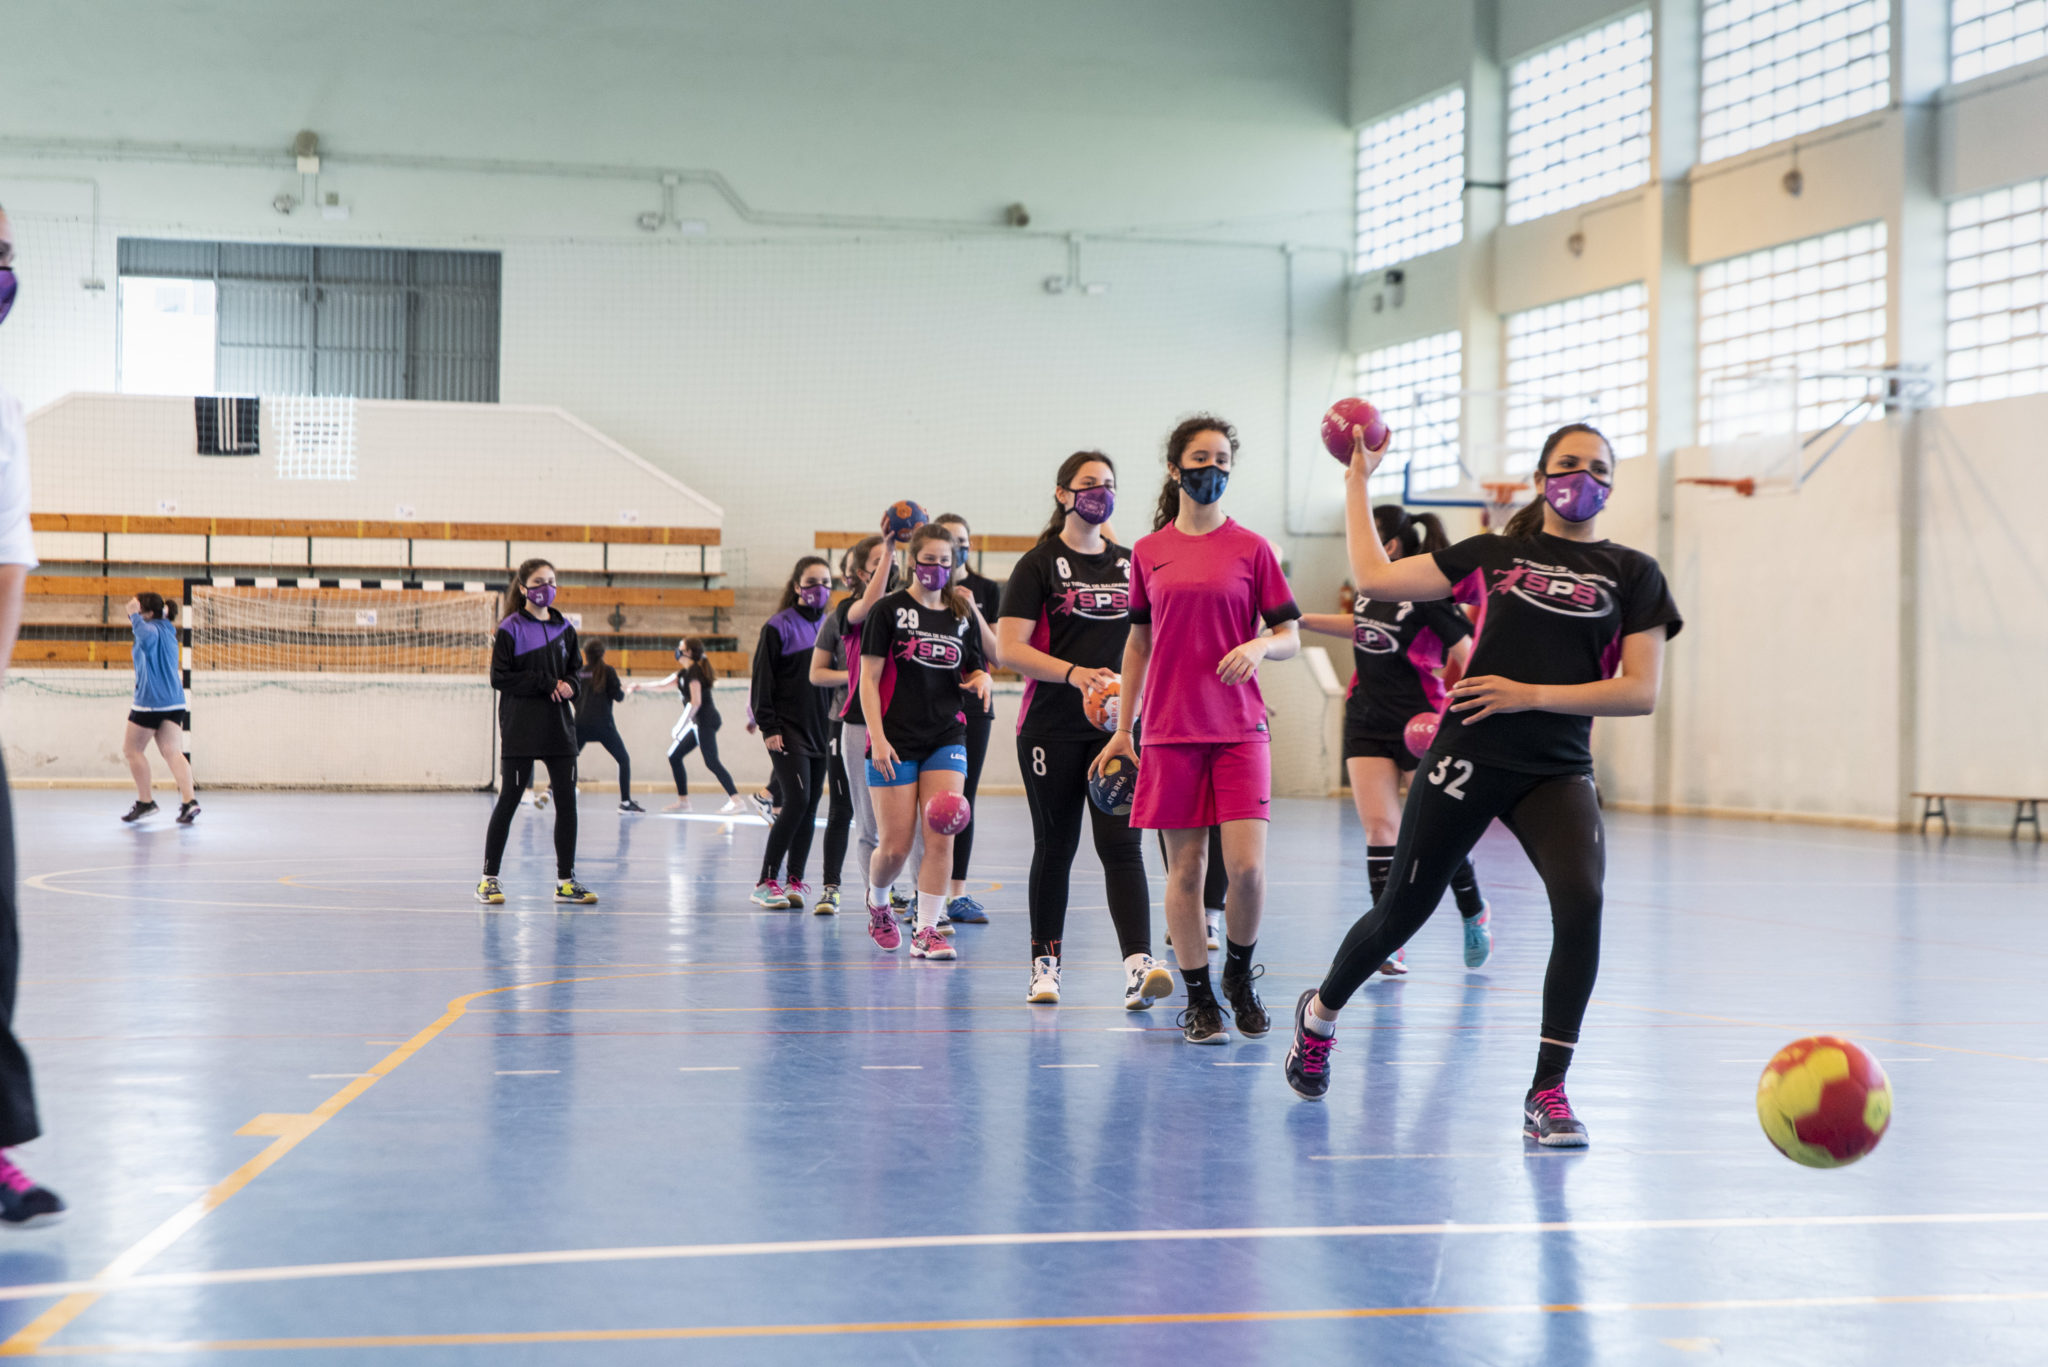 Adestramento do Balonmano Brigantium / ÍÑIGO ROLÁN